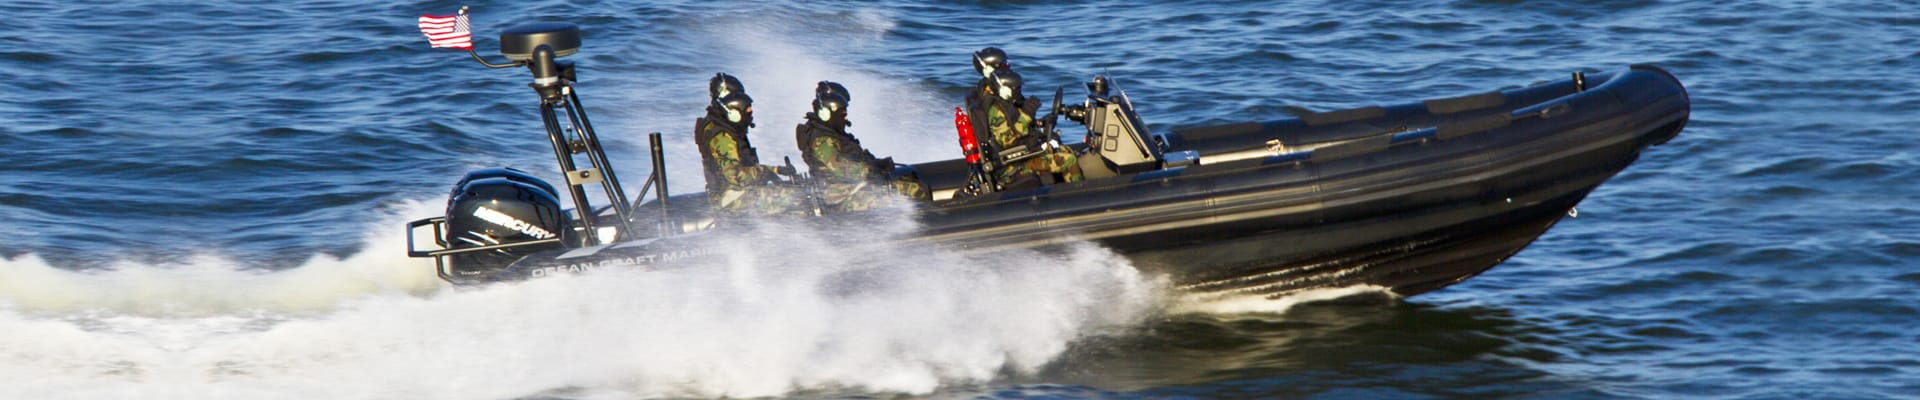 Coast-Guard-Boats